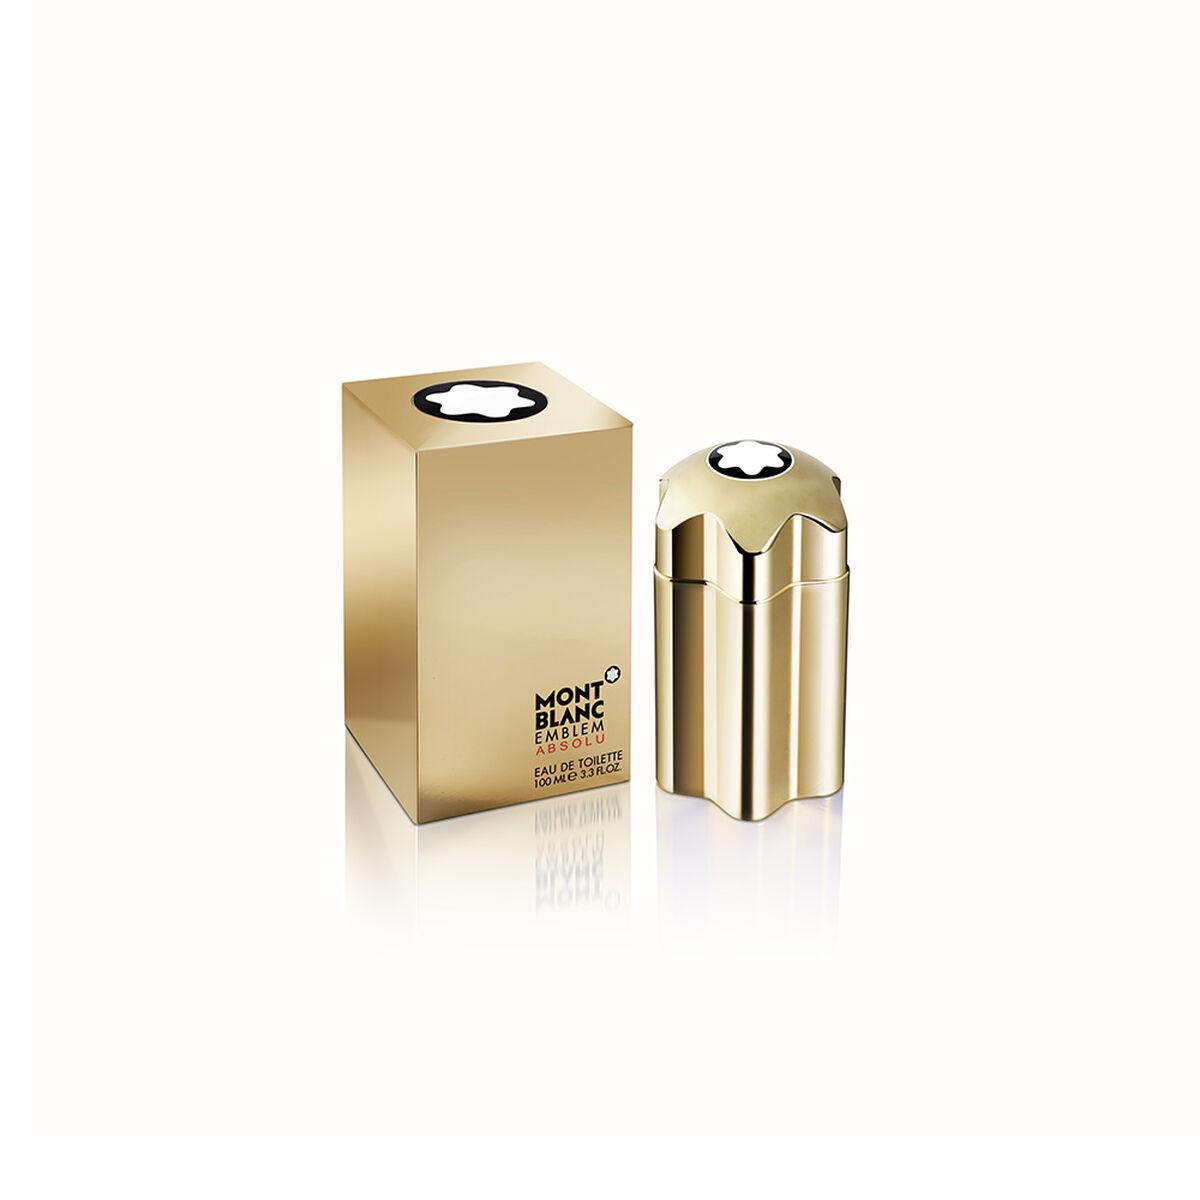 Perfume Montblanc Absolu EDP 100 ml